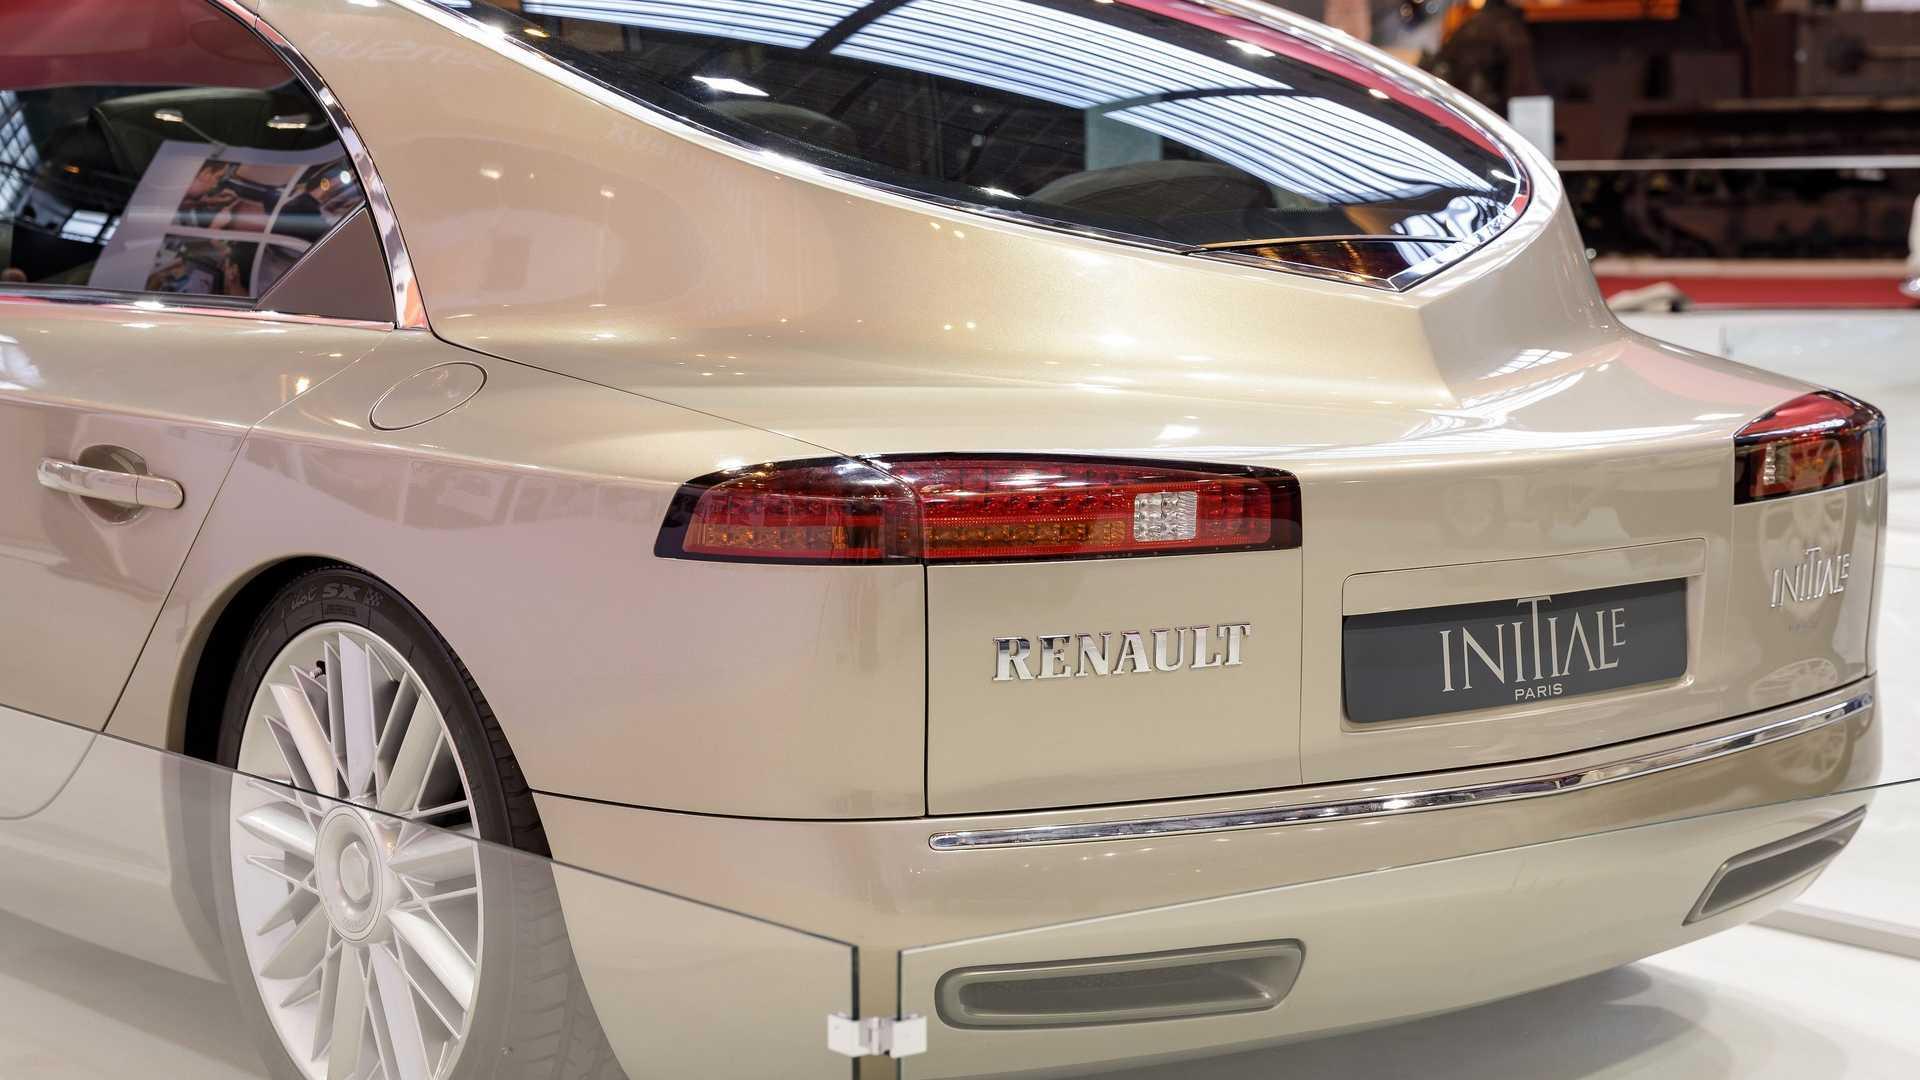 1995-renault-initiale-concept16